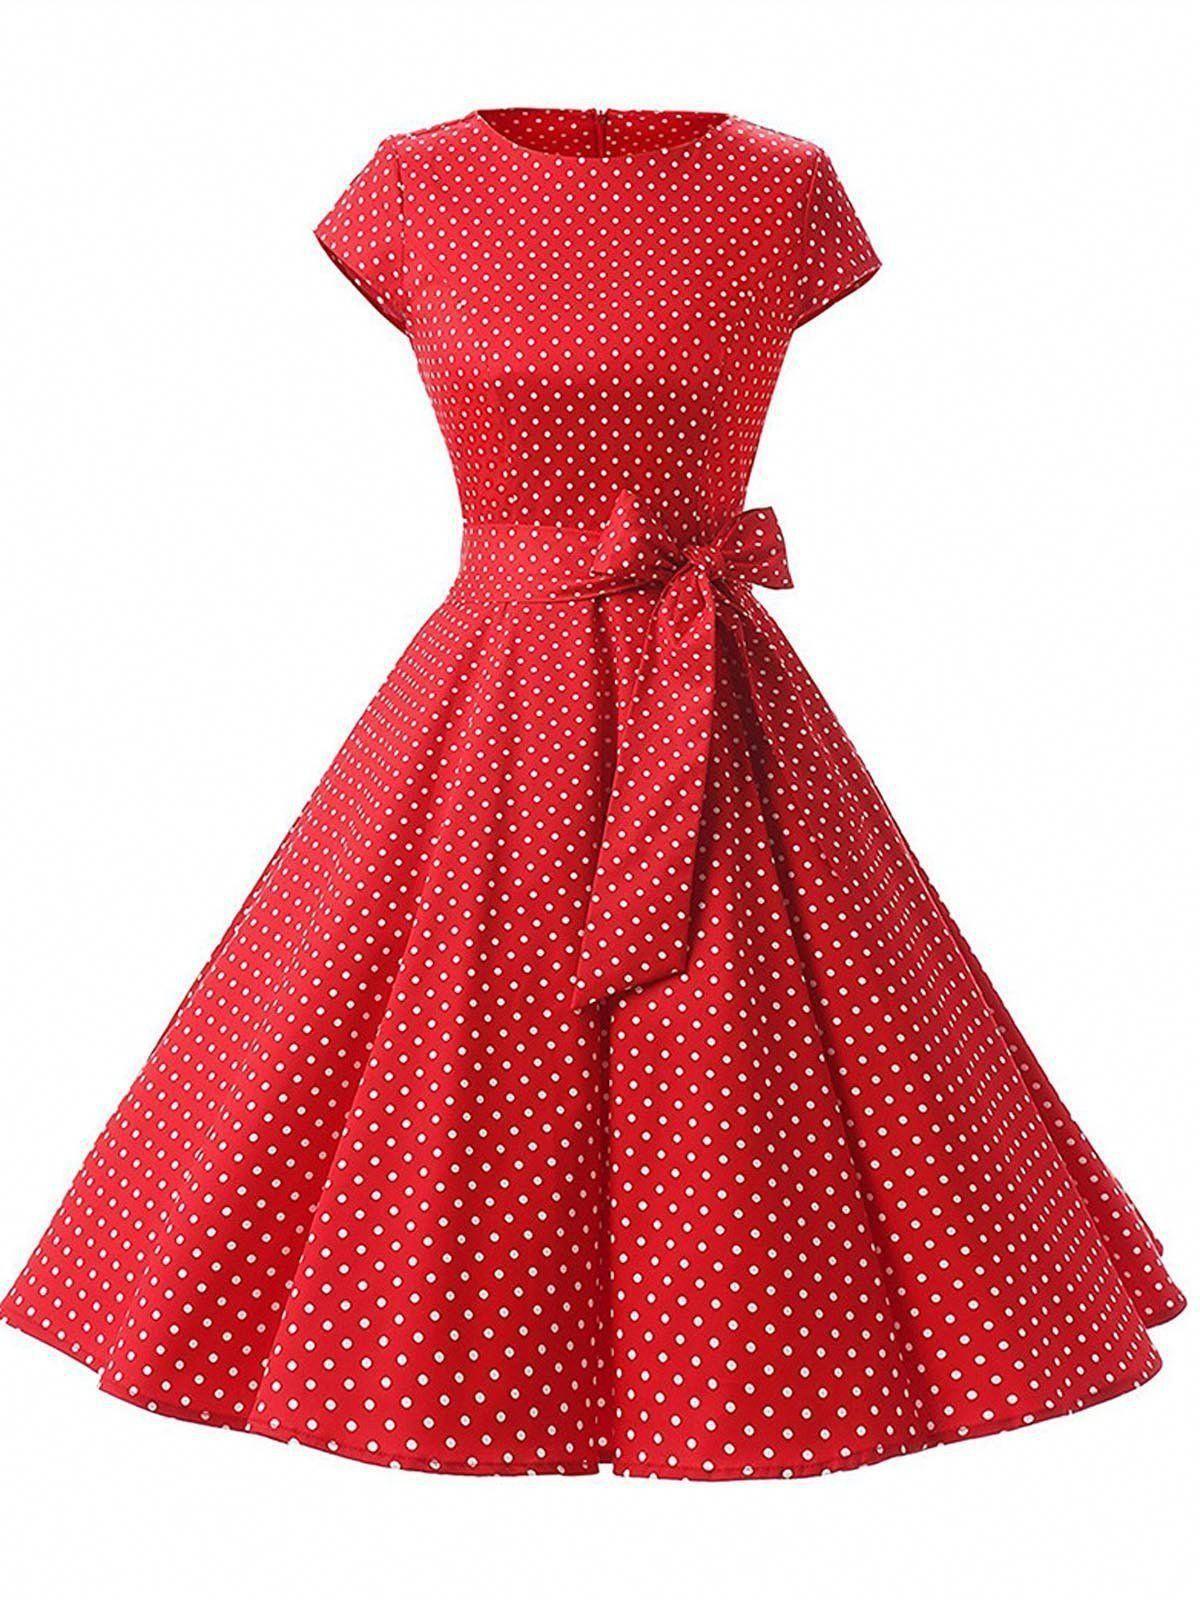 Red 1950s Polka Dot Swing Dress #vintage dress #prom dress #Flapper Dress #dresses #evening dress #LongSleeveBlackCocktailDress